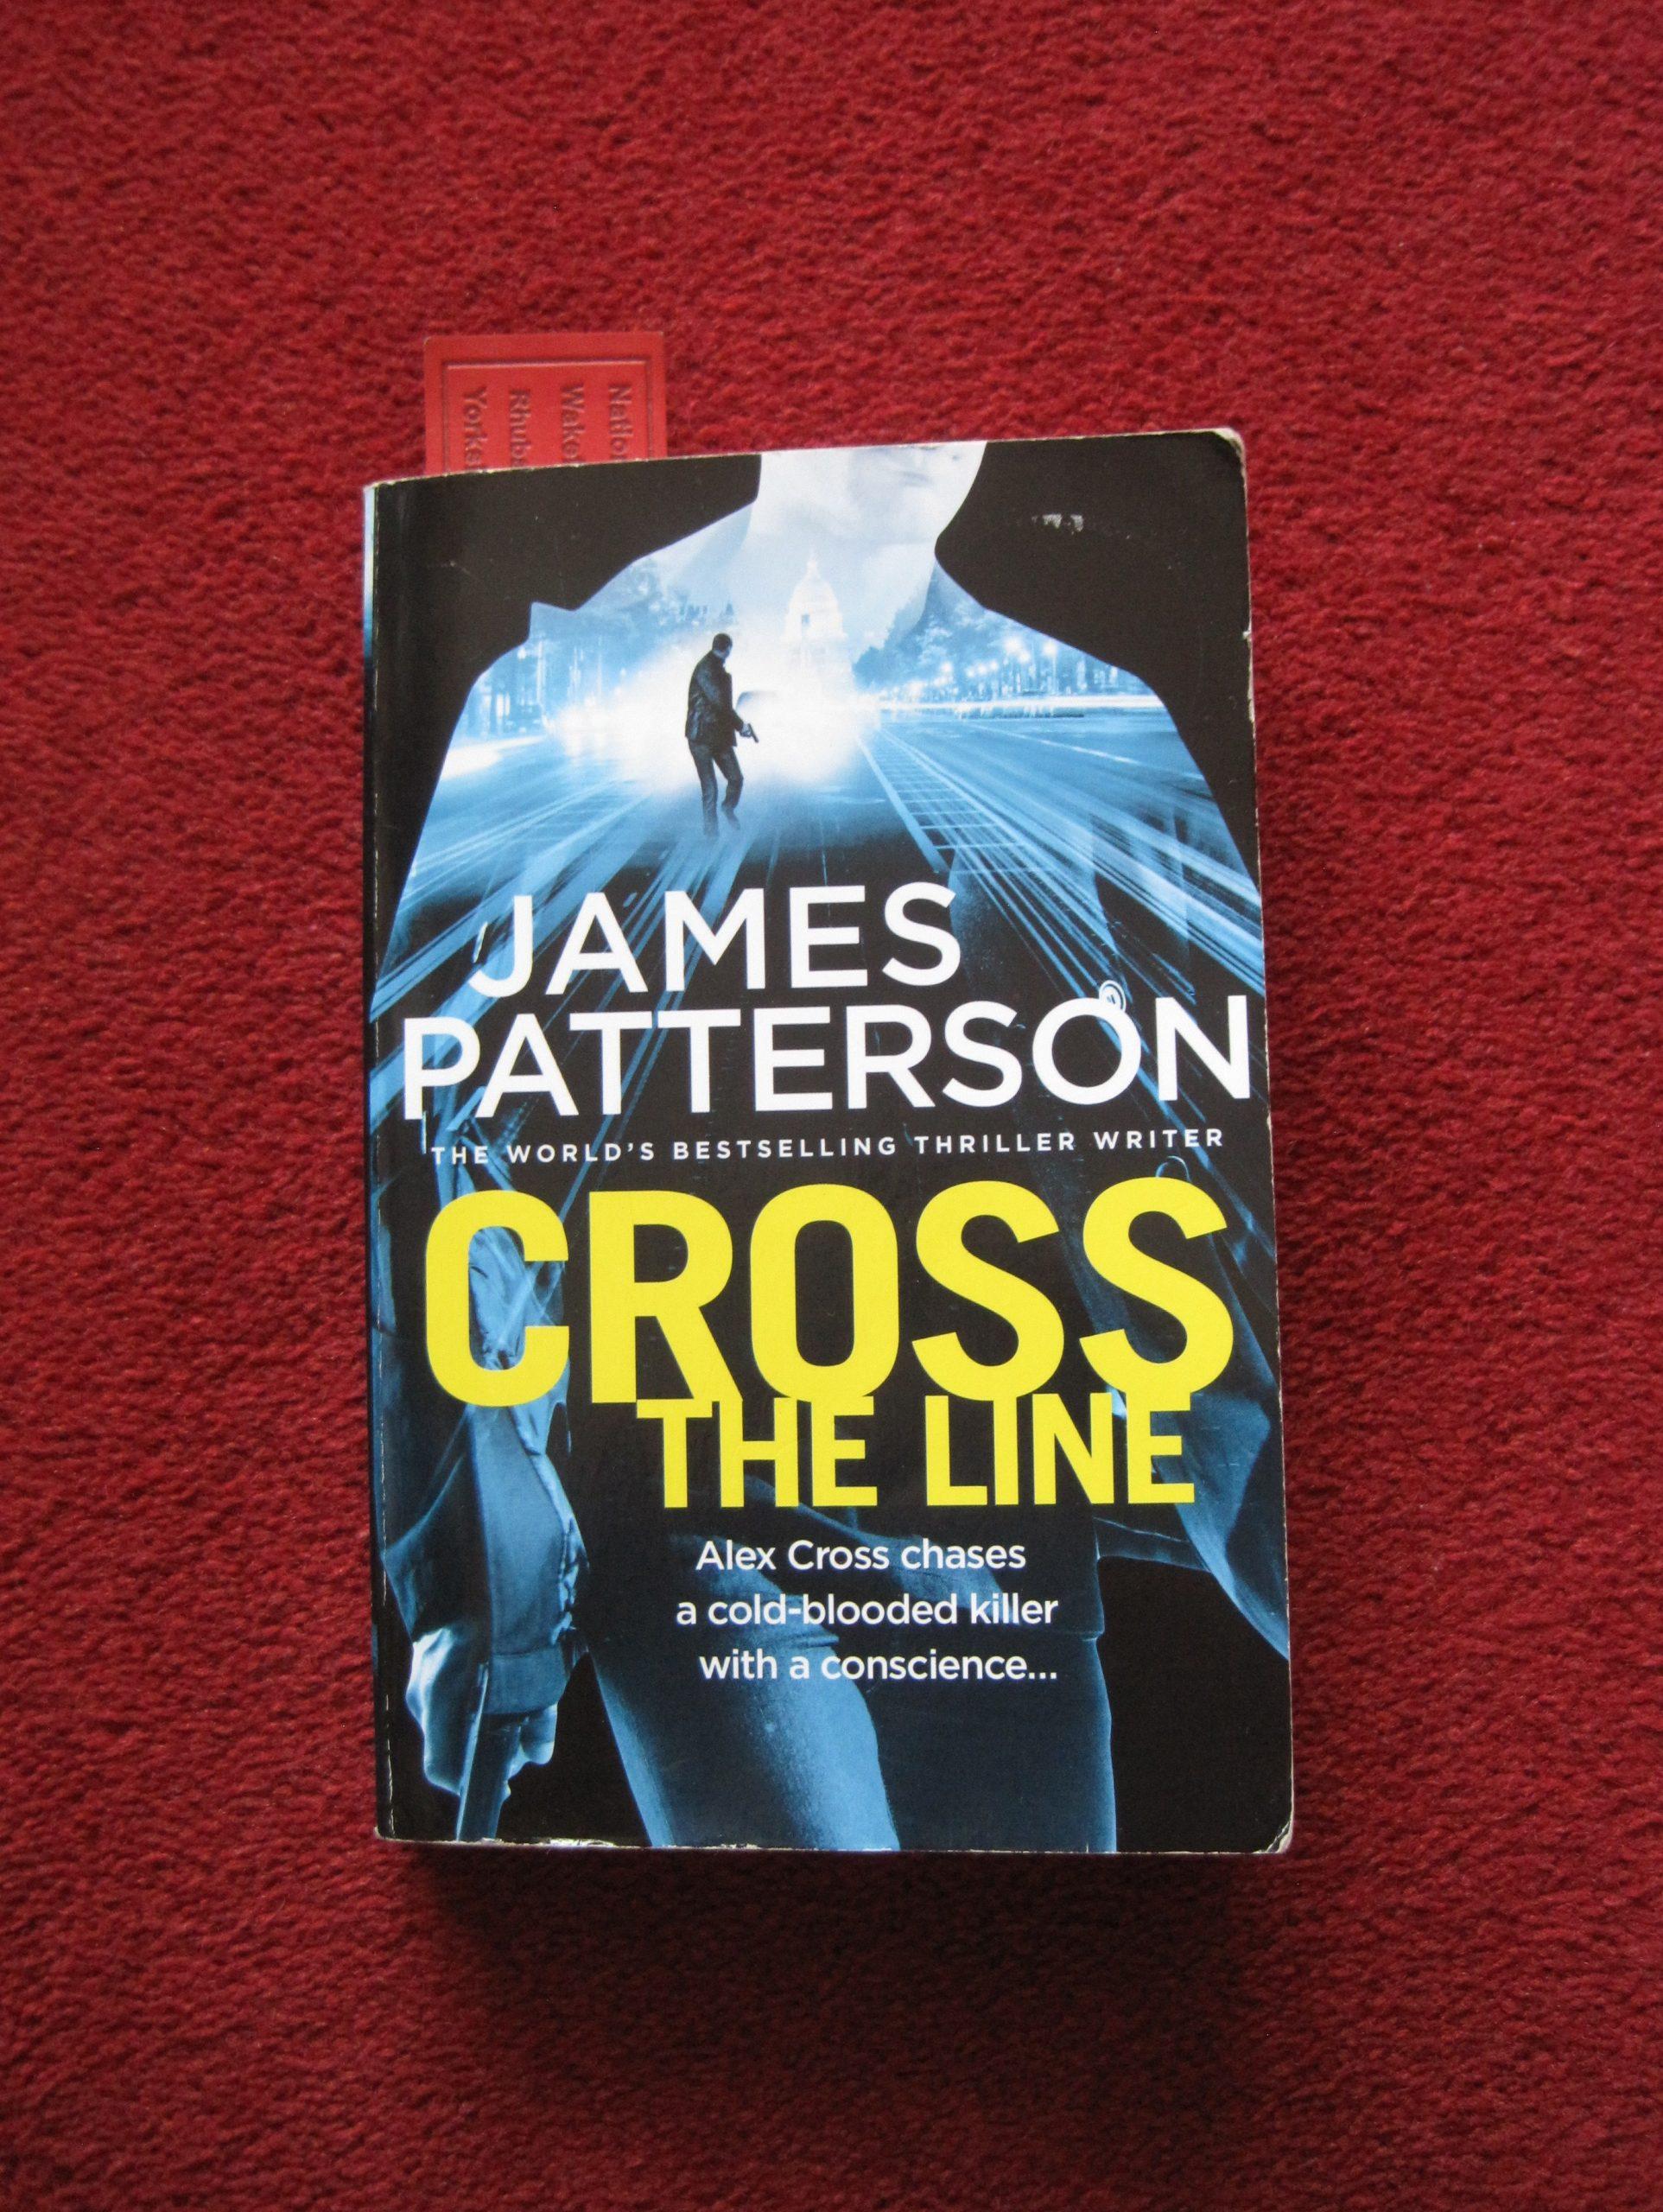 Cross The Line - photo by Juliamaud